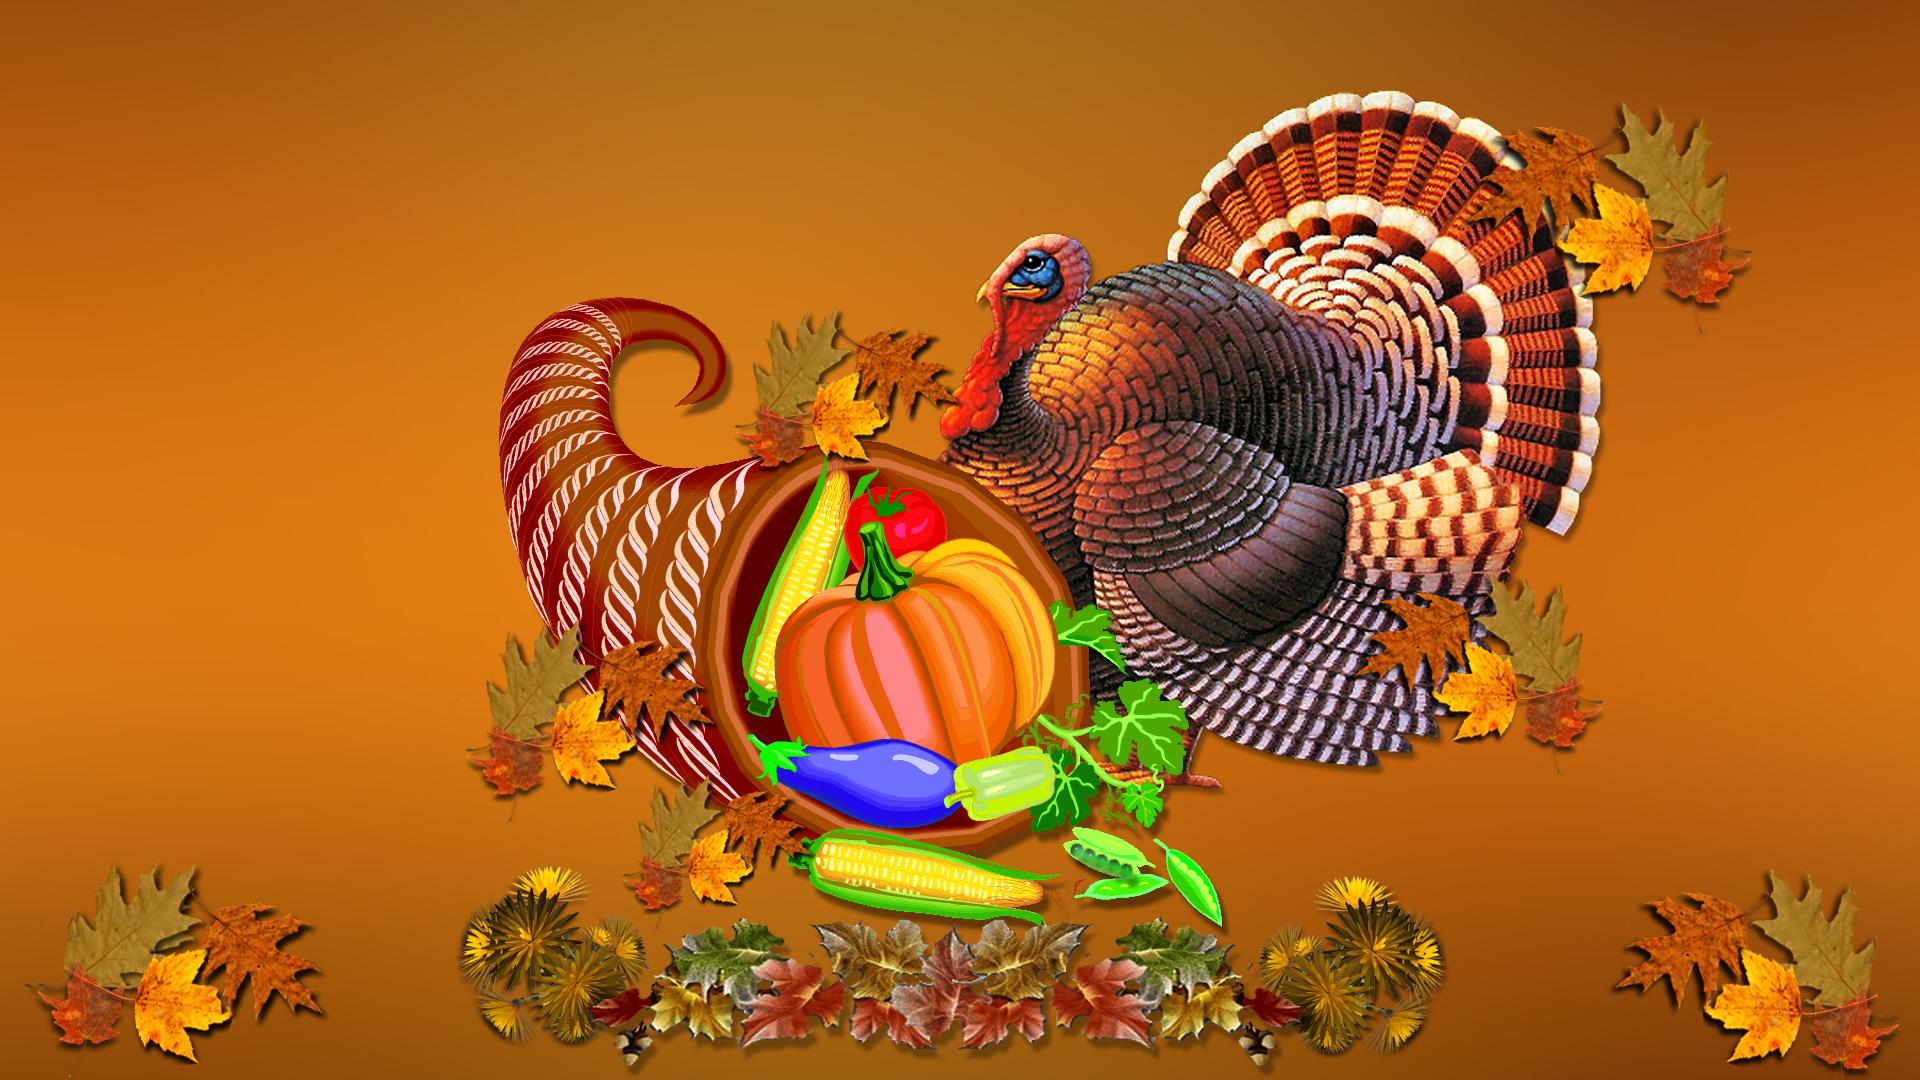 Thanksgiving turkey wallpaper wallpapersafari - Thanksgiving day wallpaper 3d ...